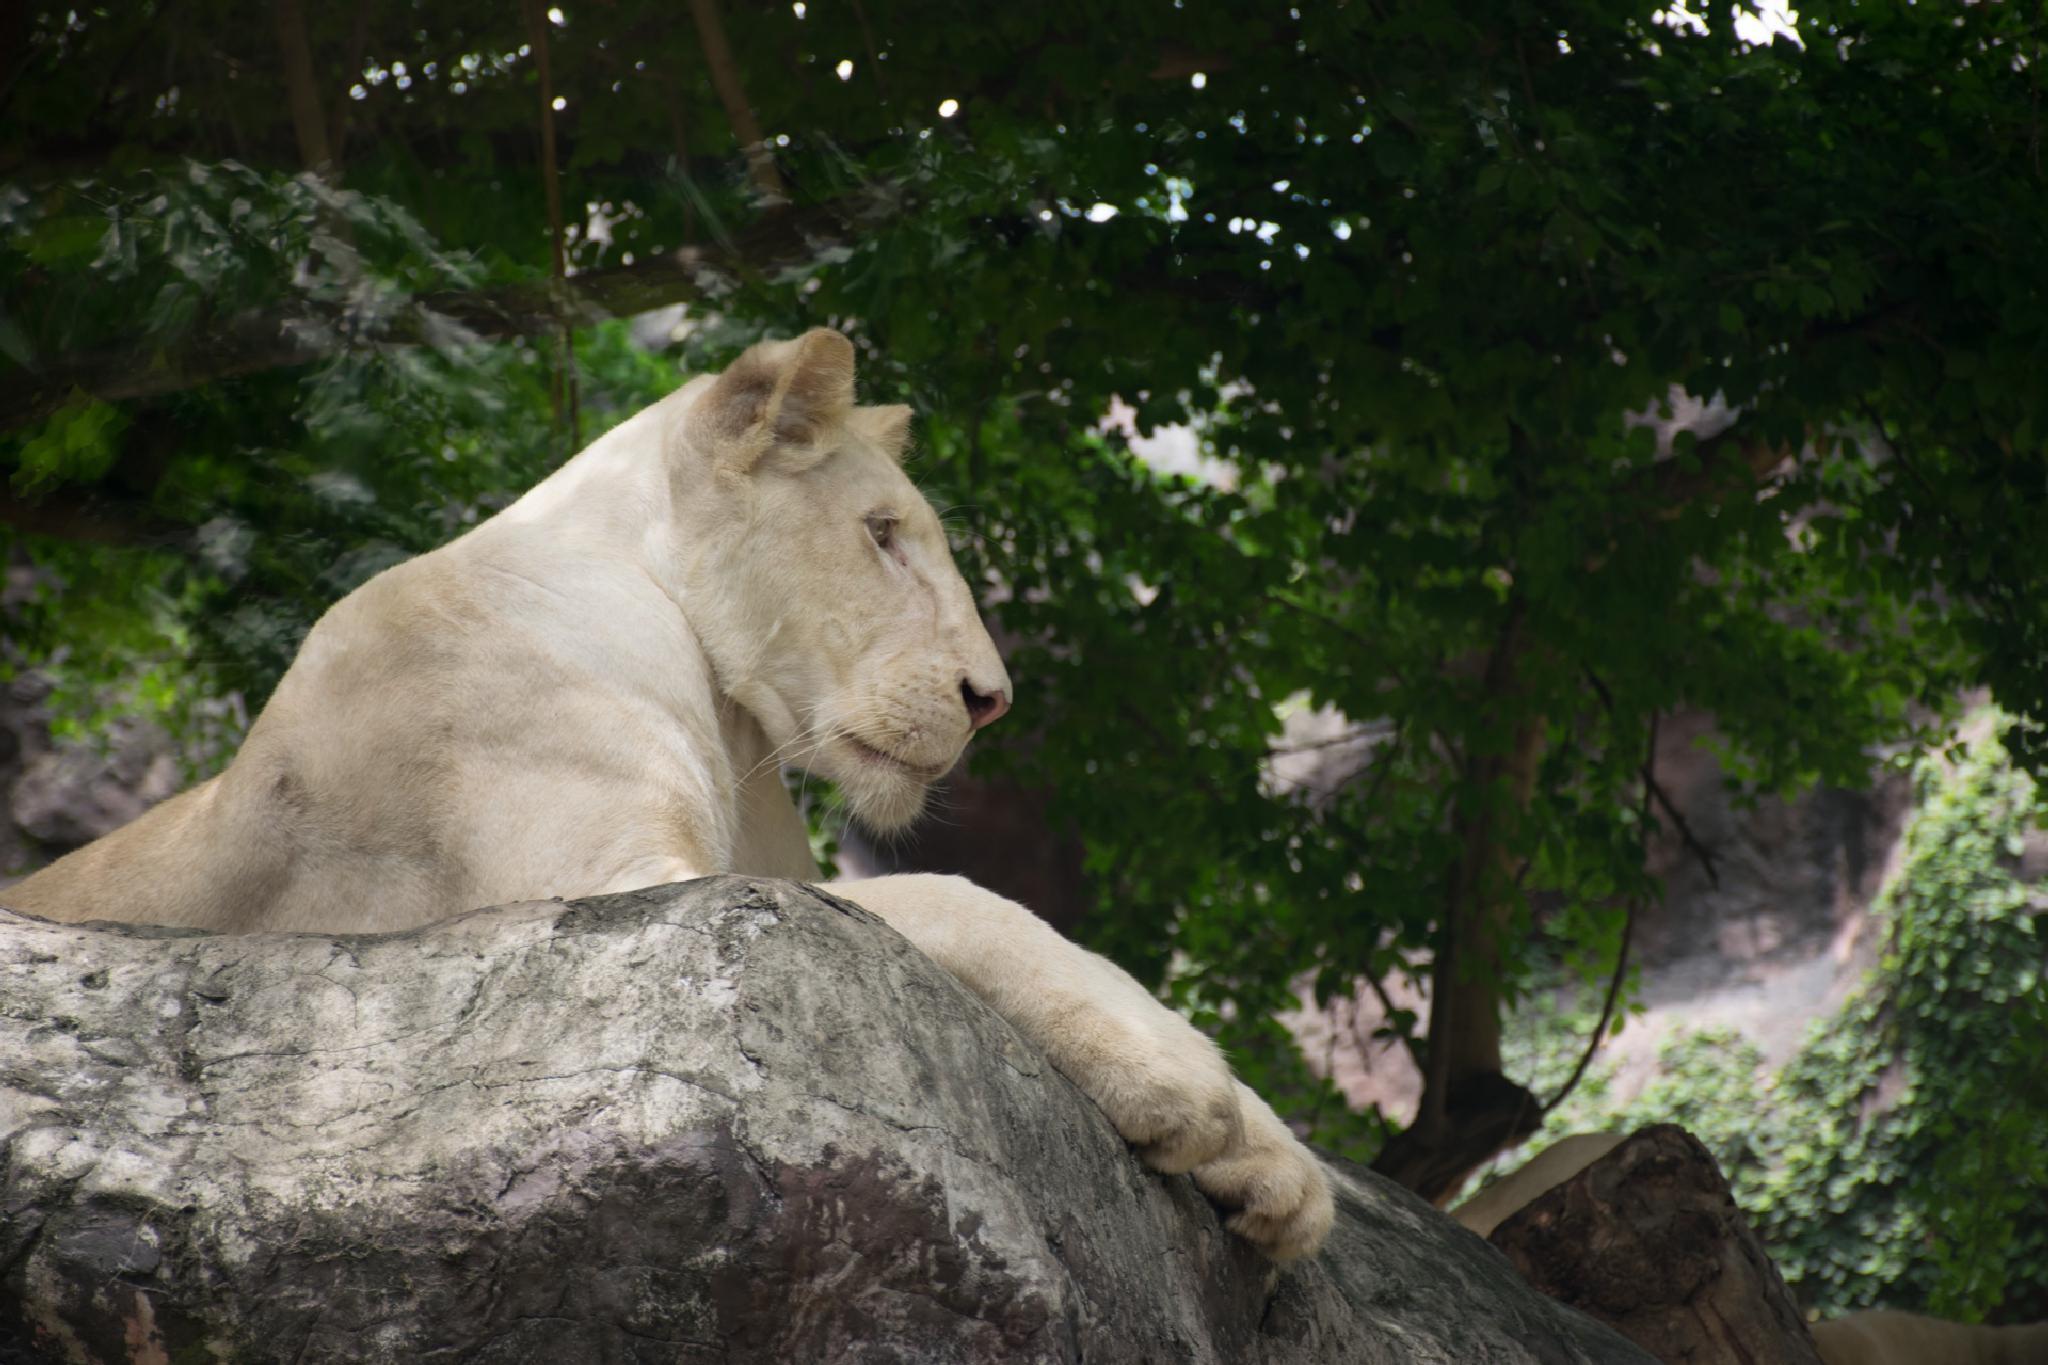 Lion at Dusit park by Jade aHa